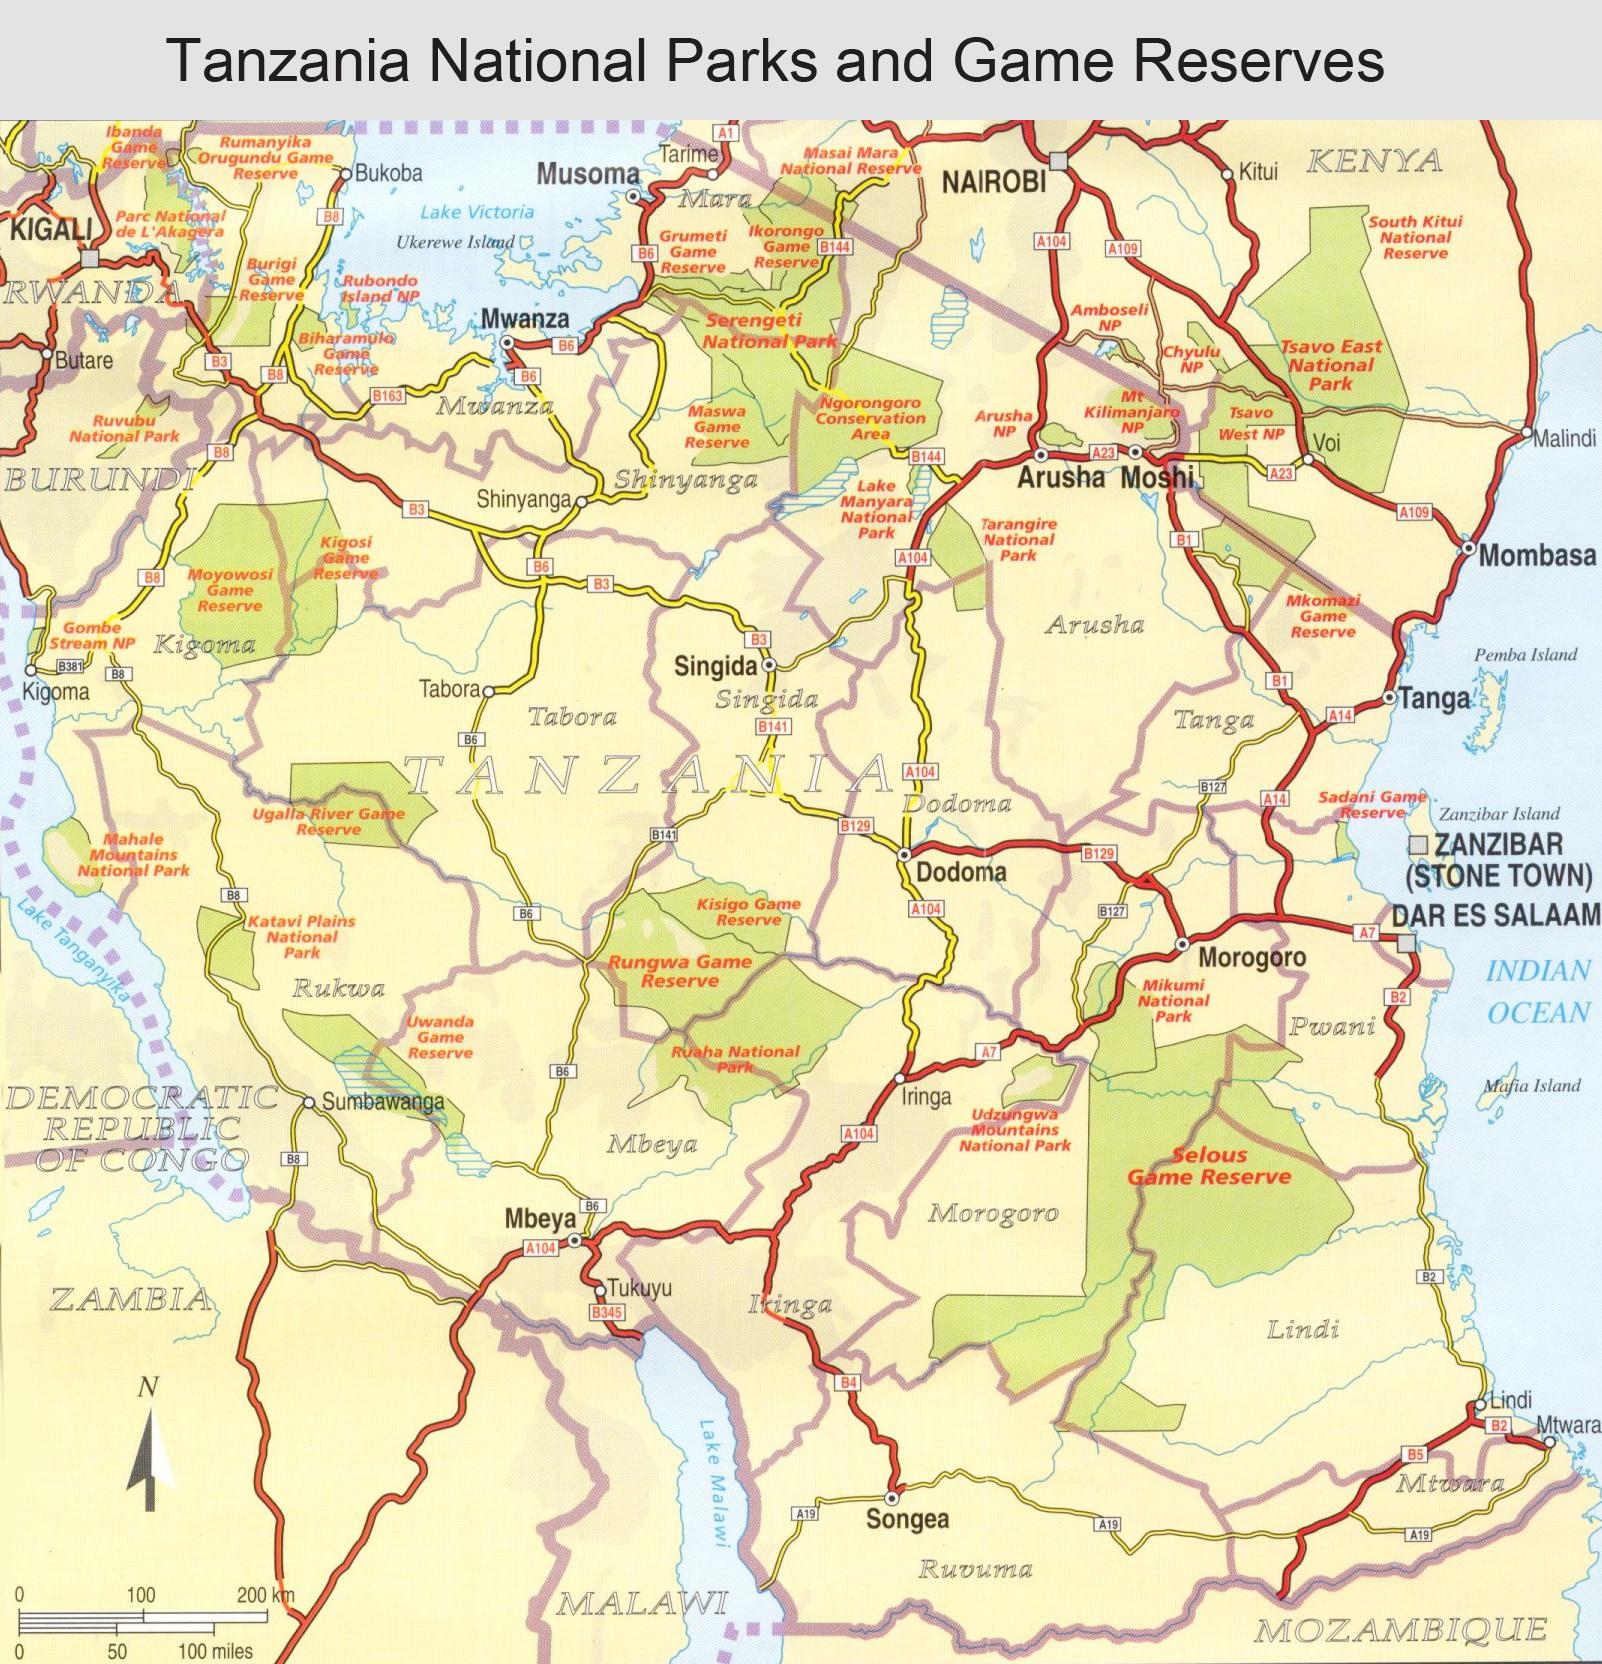 kart over tanzania 4 nasjonalparker i syd   9 dager   Reisejournalist kart over tanzania